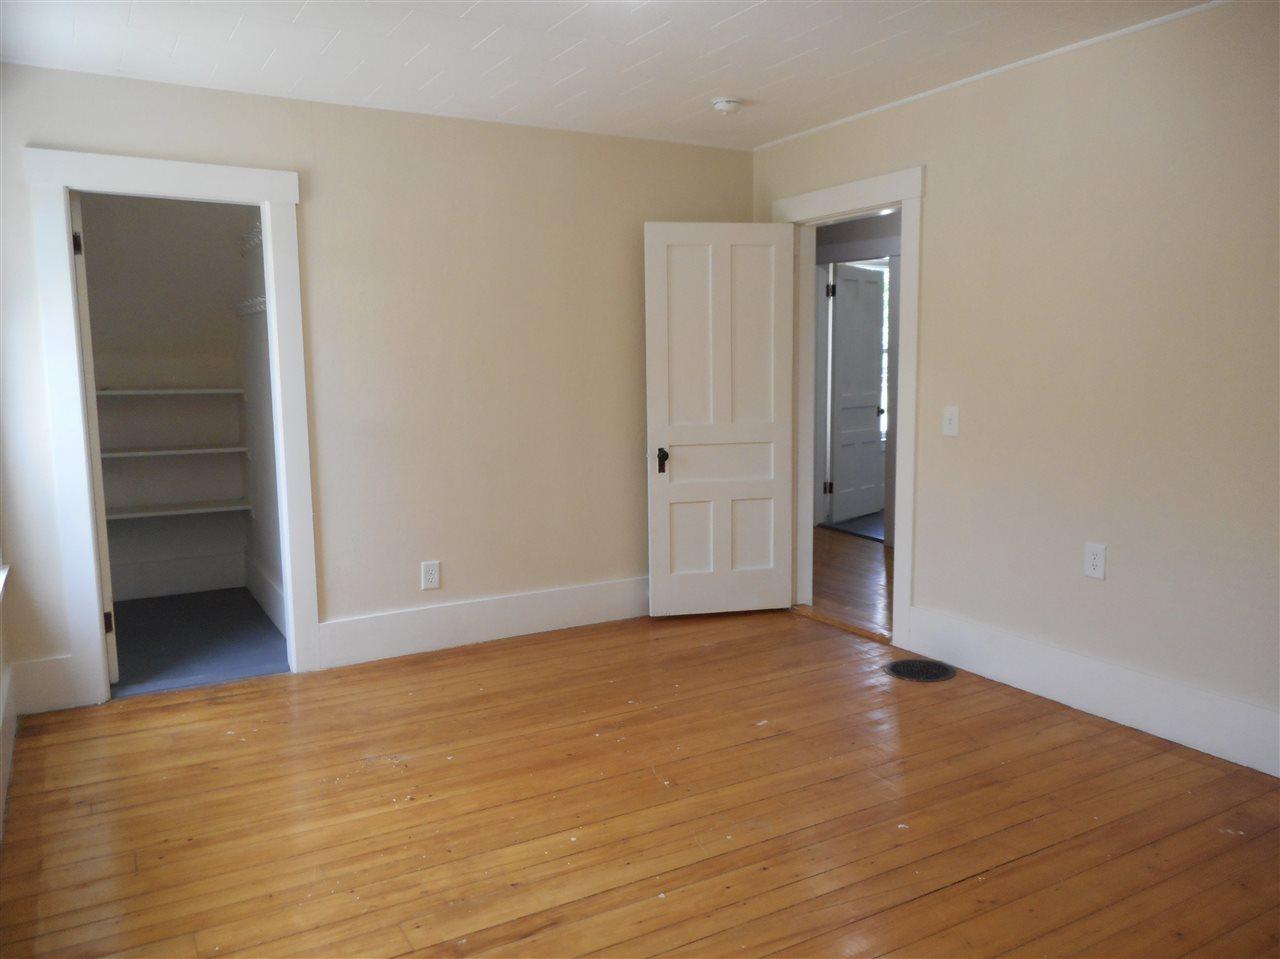 Vermont-Real-Estate-4651704-19